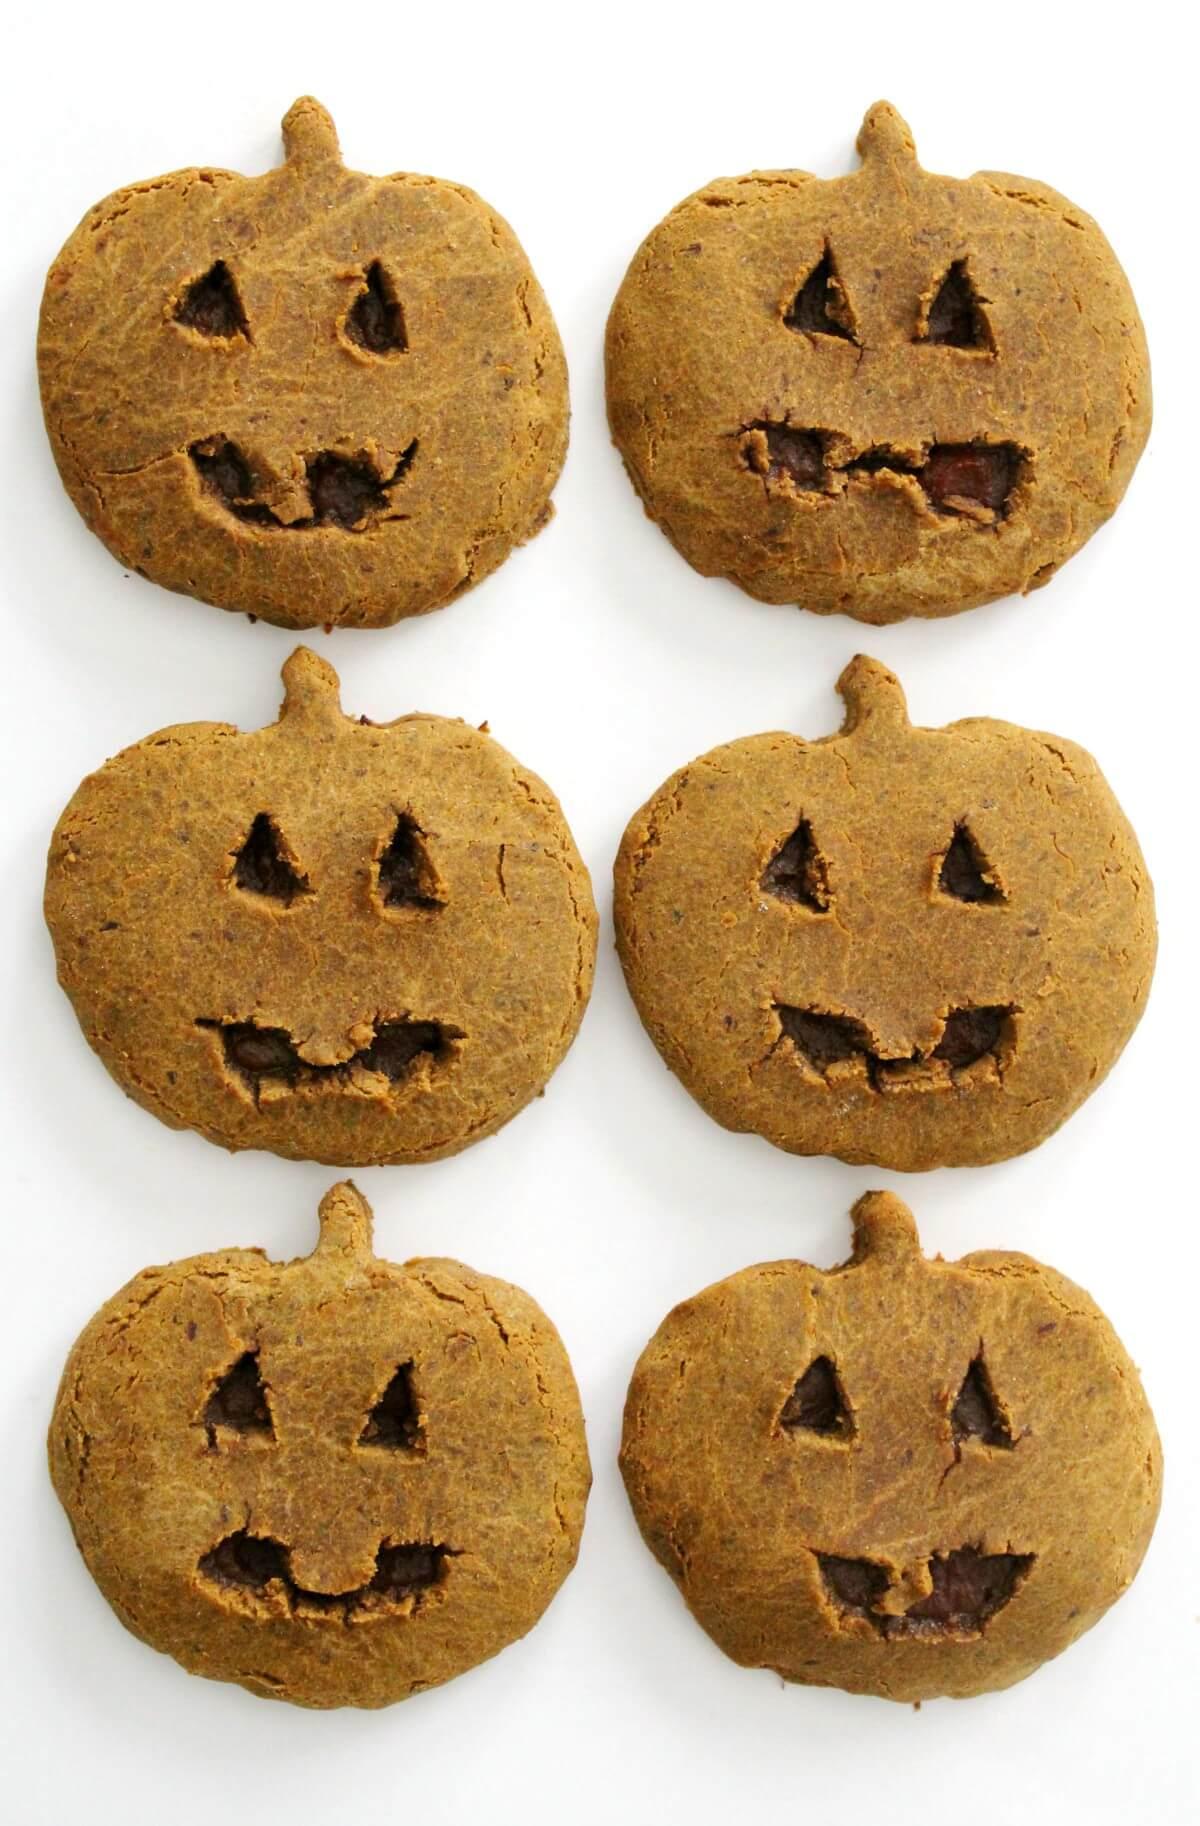 6 homemade little debbie pumpkin delights in 2 rows